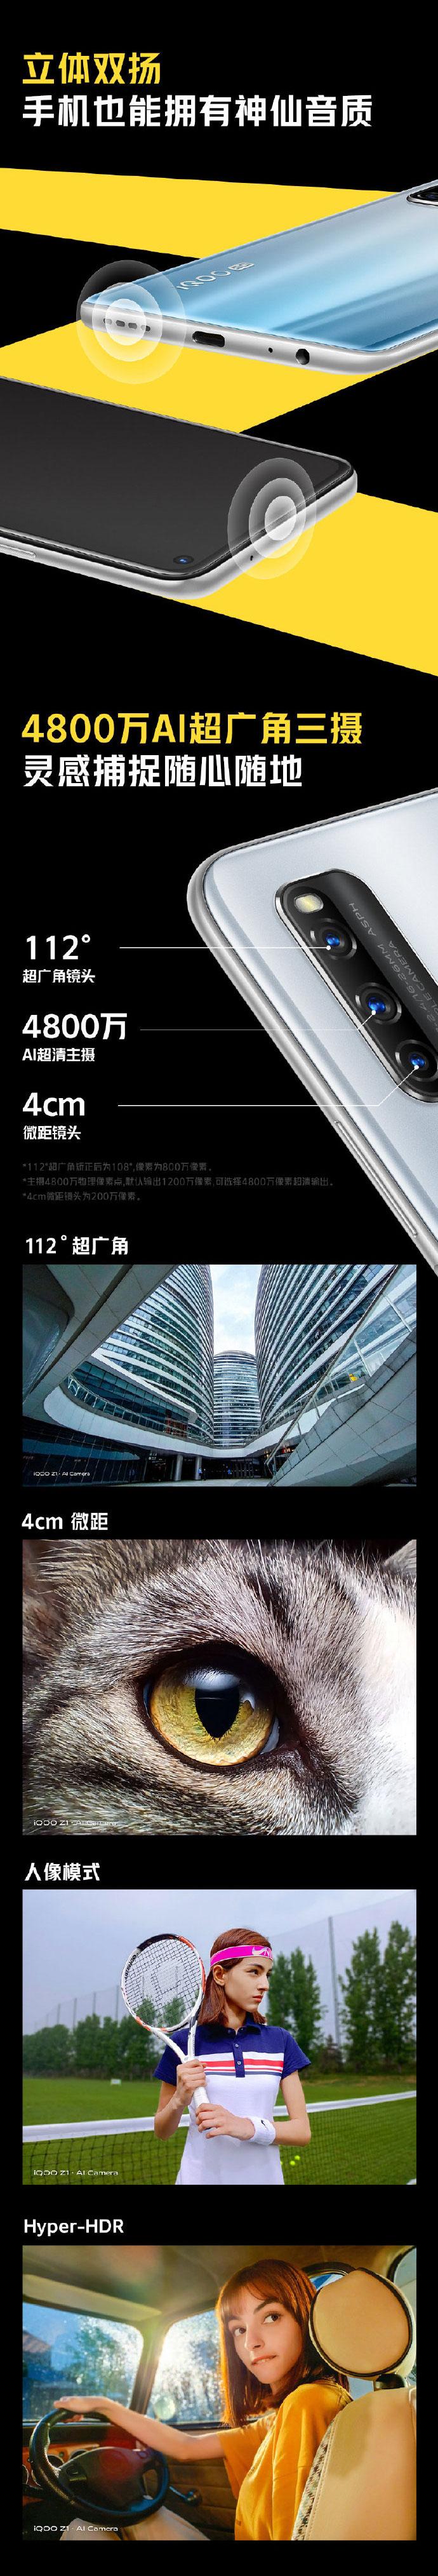 5G-SoC-1000Plus_04